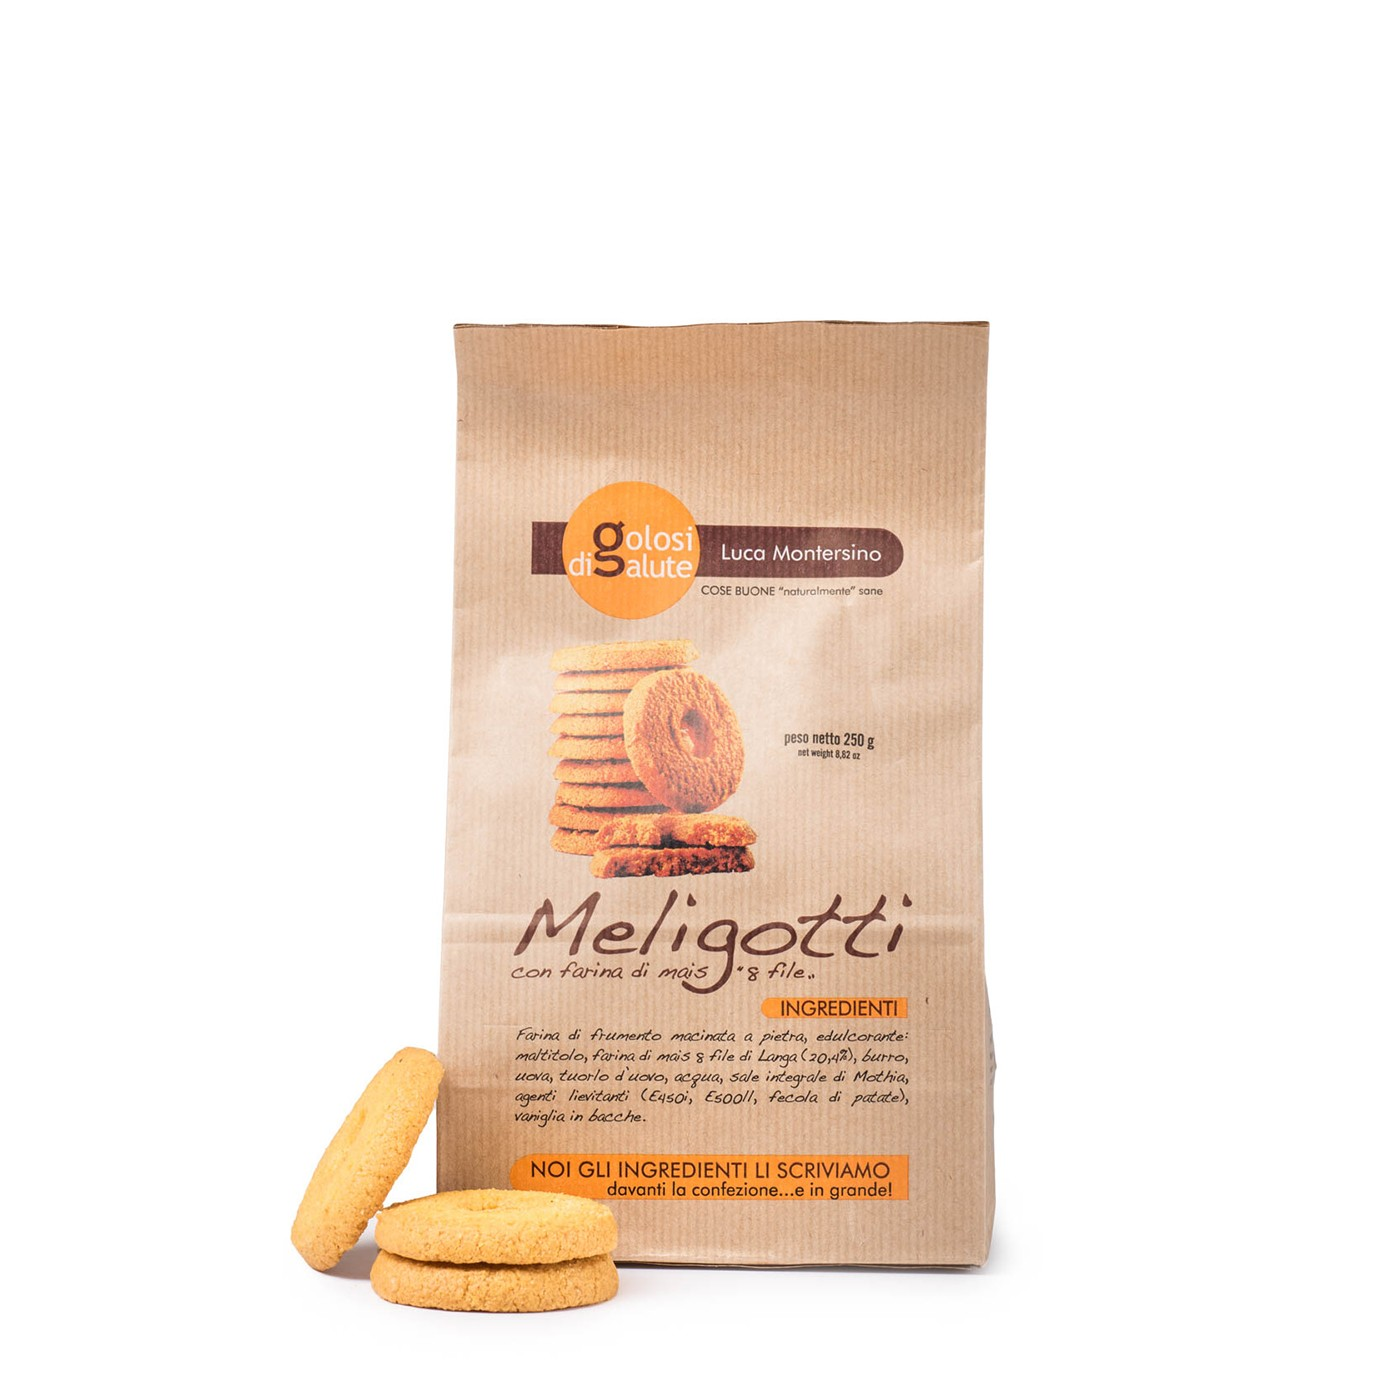 Meligotti Cookies 8.8 oz